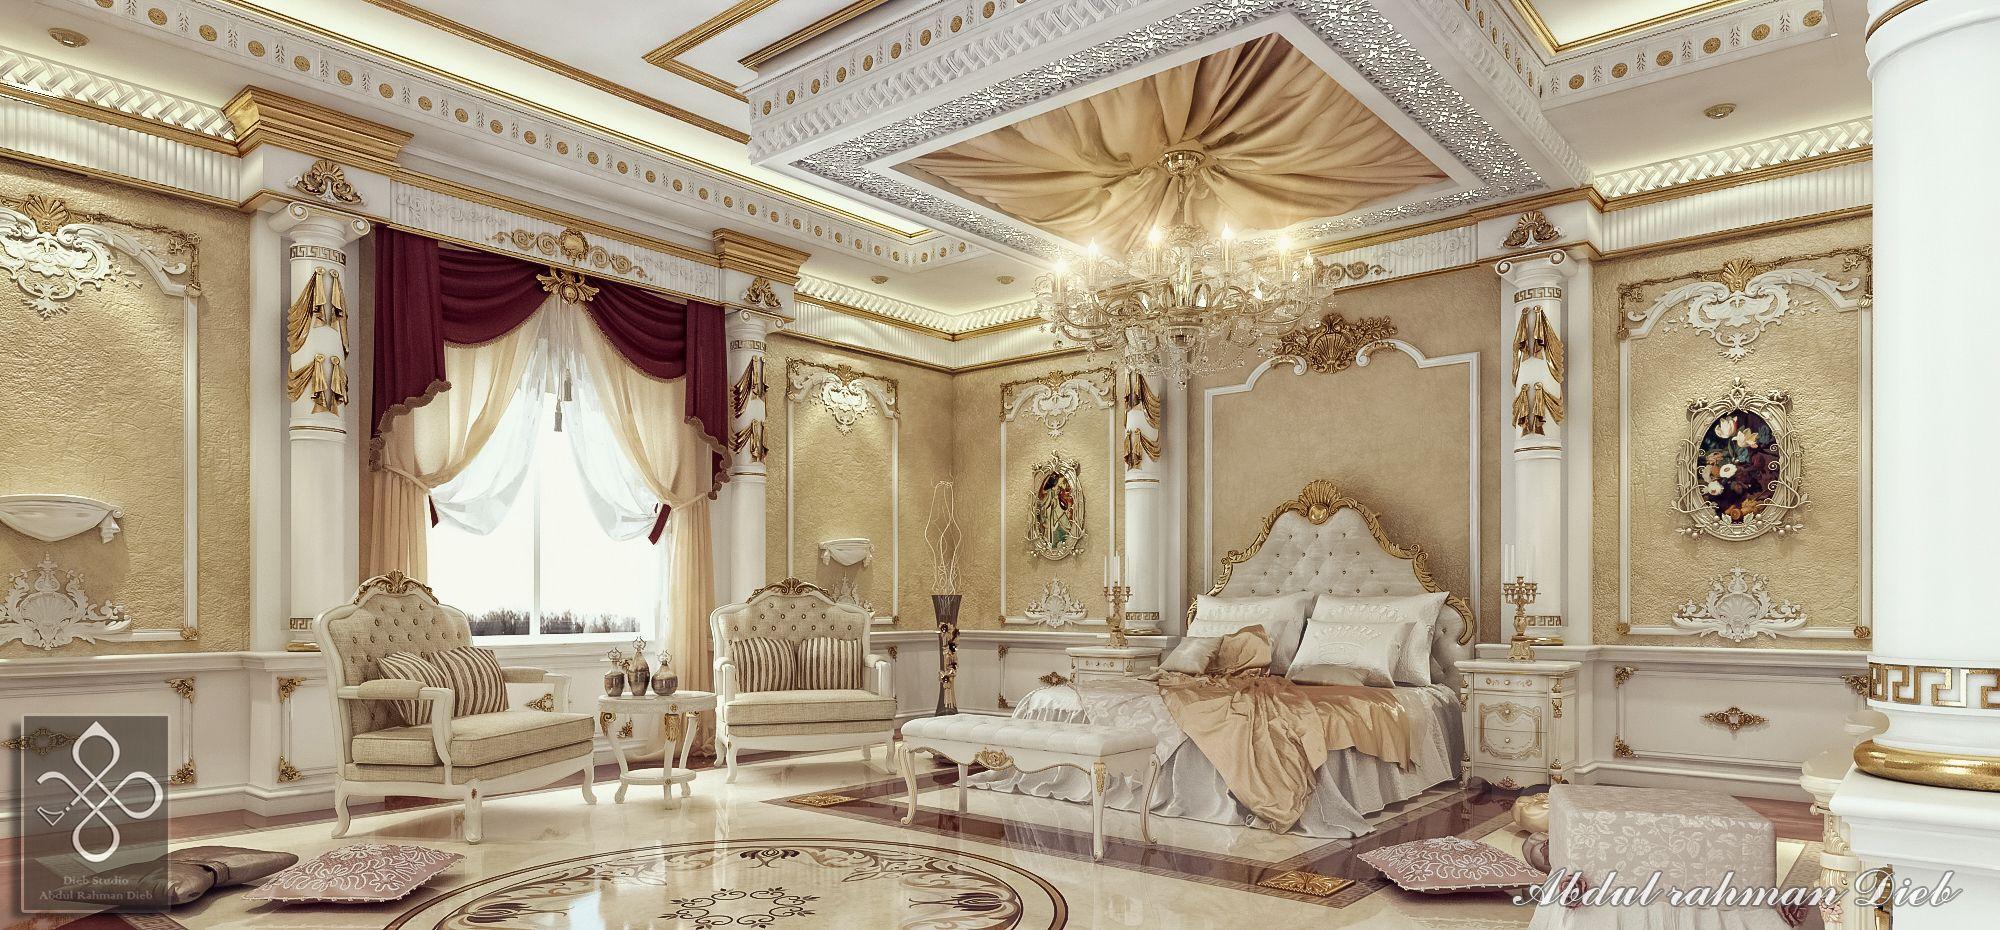 Best Idea By Erin Foley On Luxury Royalty Royal Bedroom 400 x 300